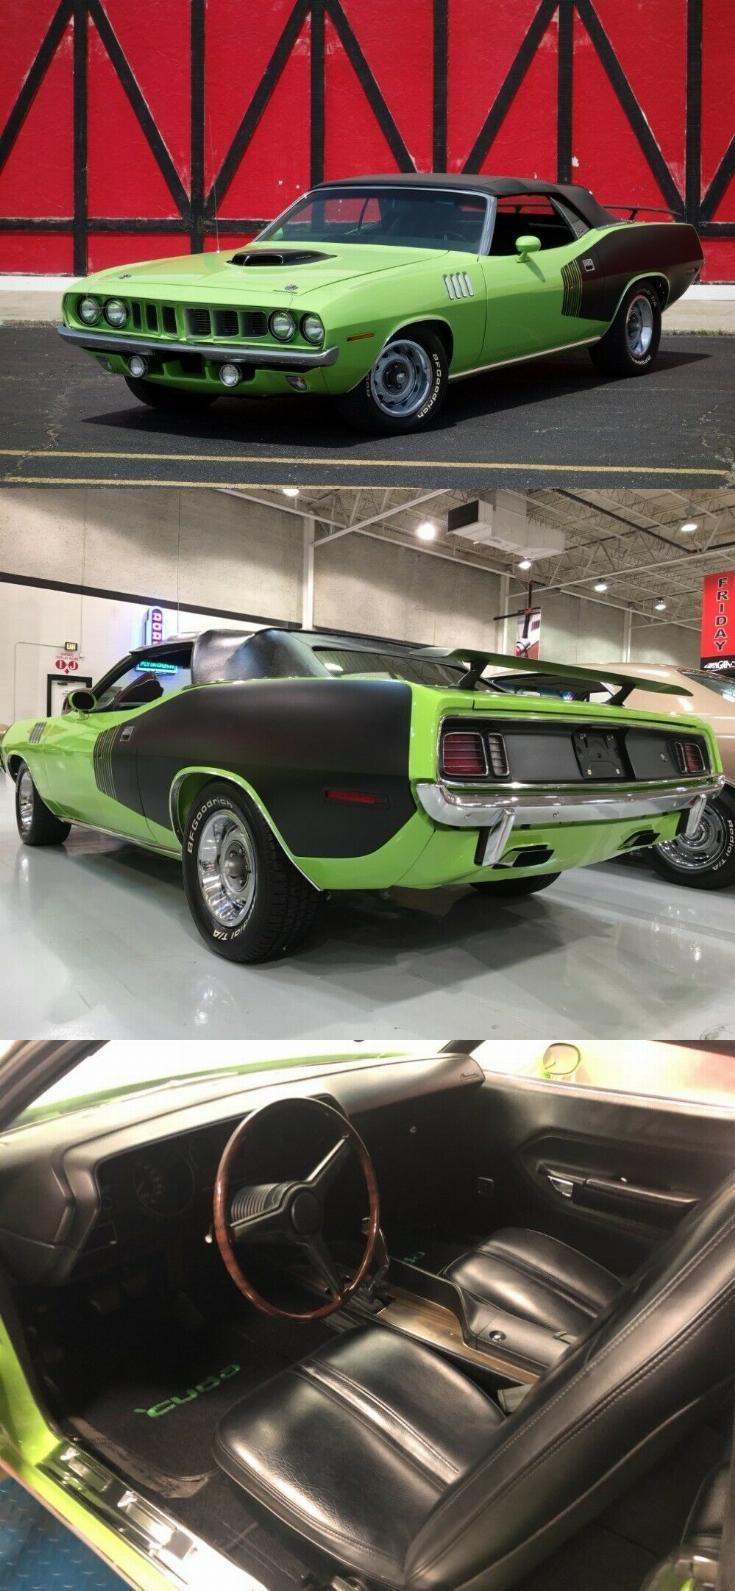 Hemi Cuda Tribute 1971 Plymouth Barracuda Convertible In 2020 Hemi Cuda Plymouth Barracuda Cuda